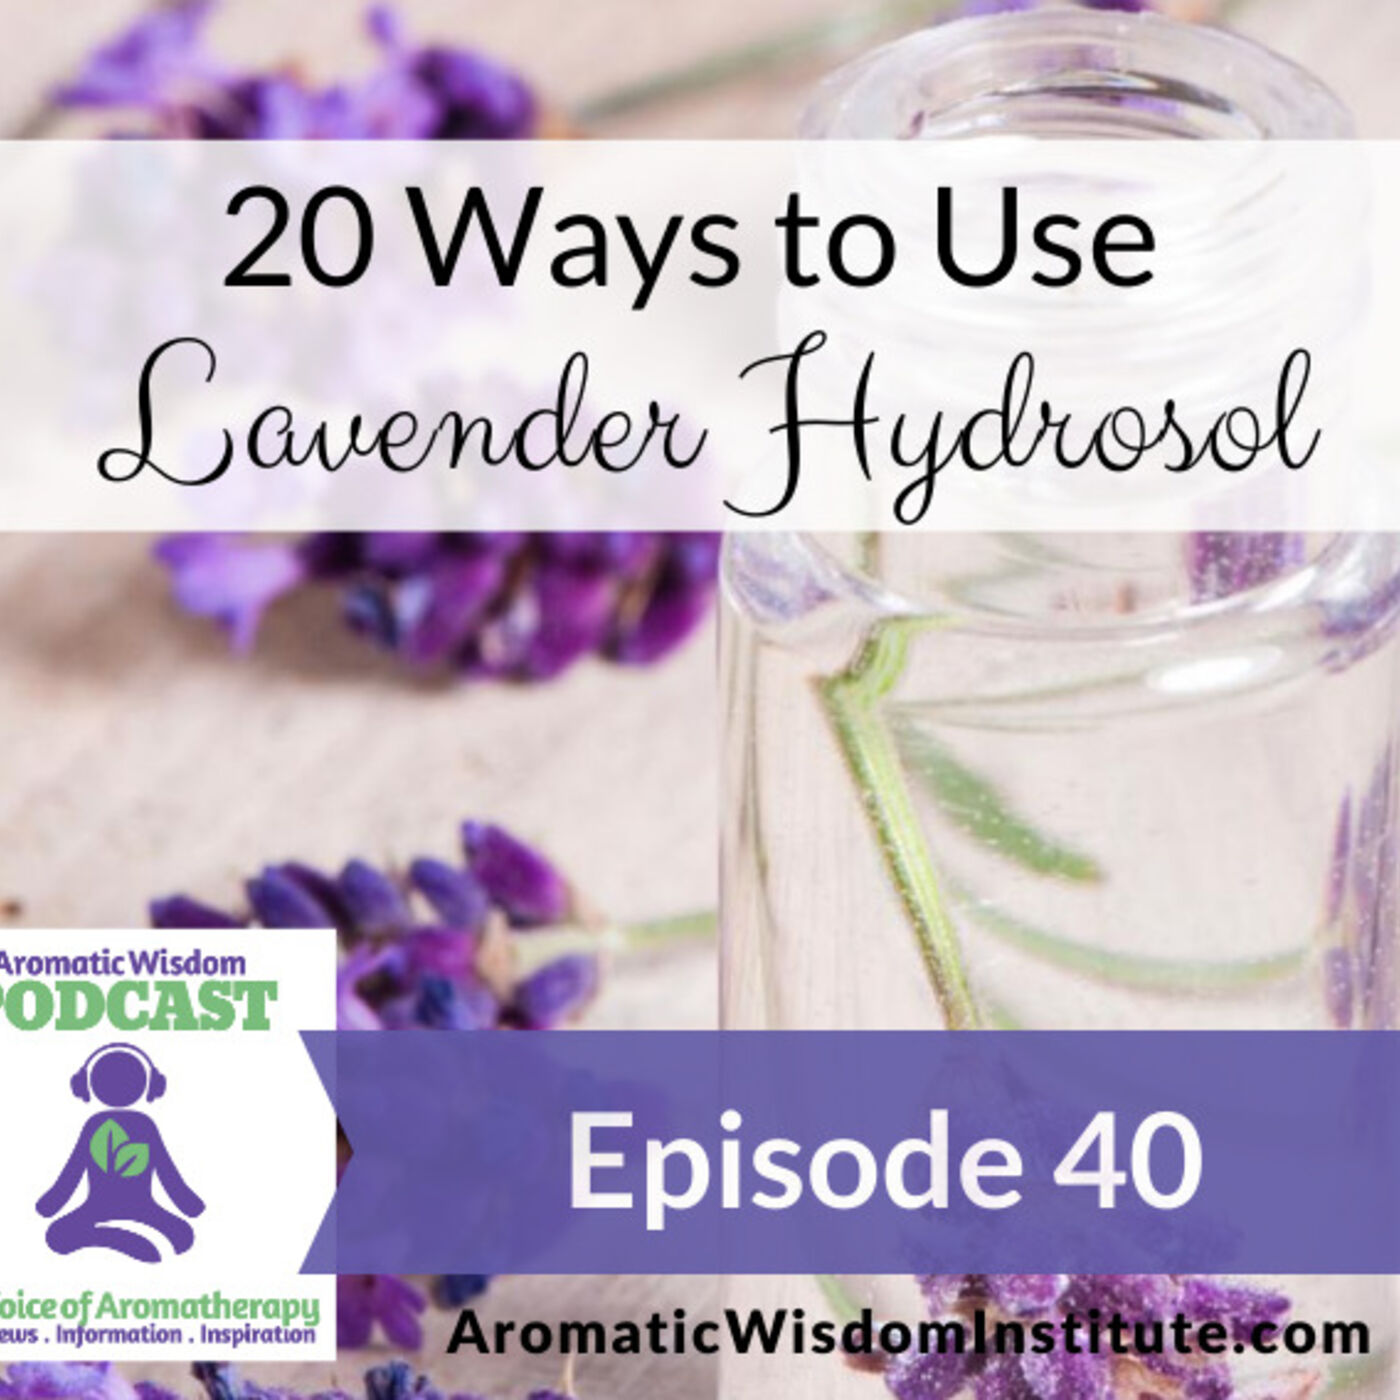 AWP 040: 20 Ways to Use Lavender Hydrosol